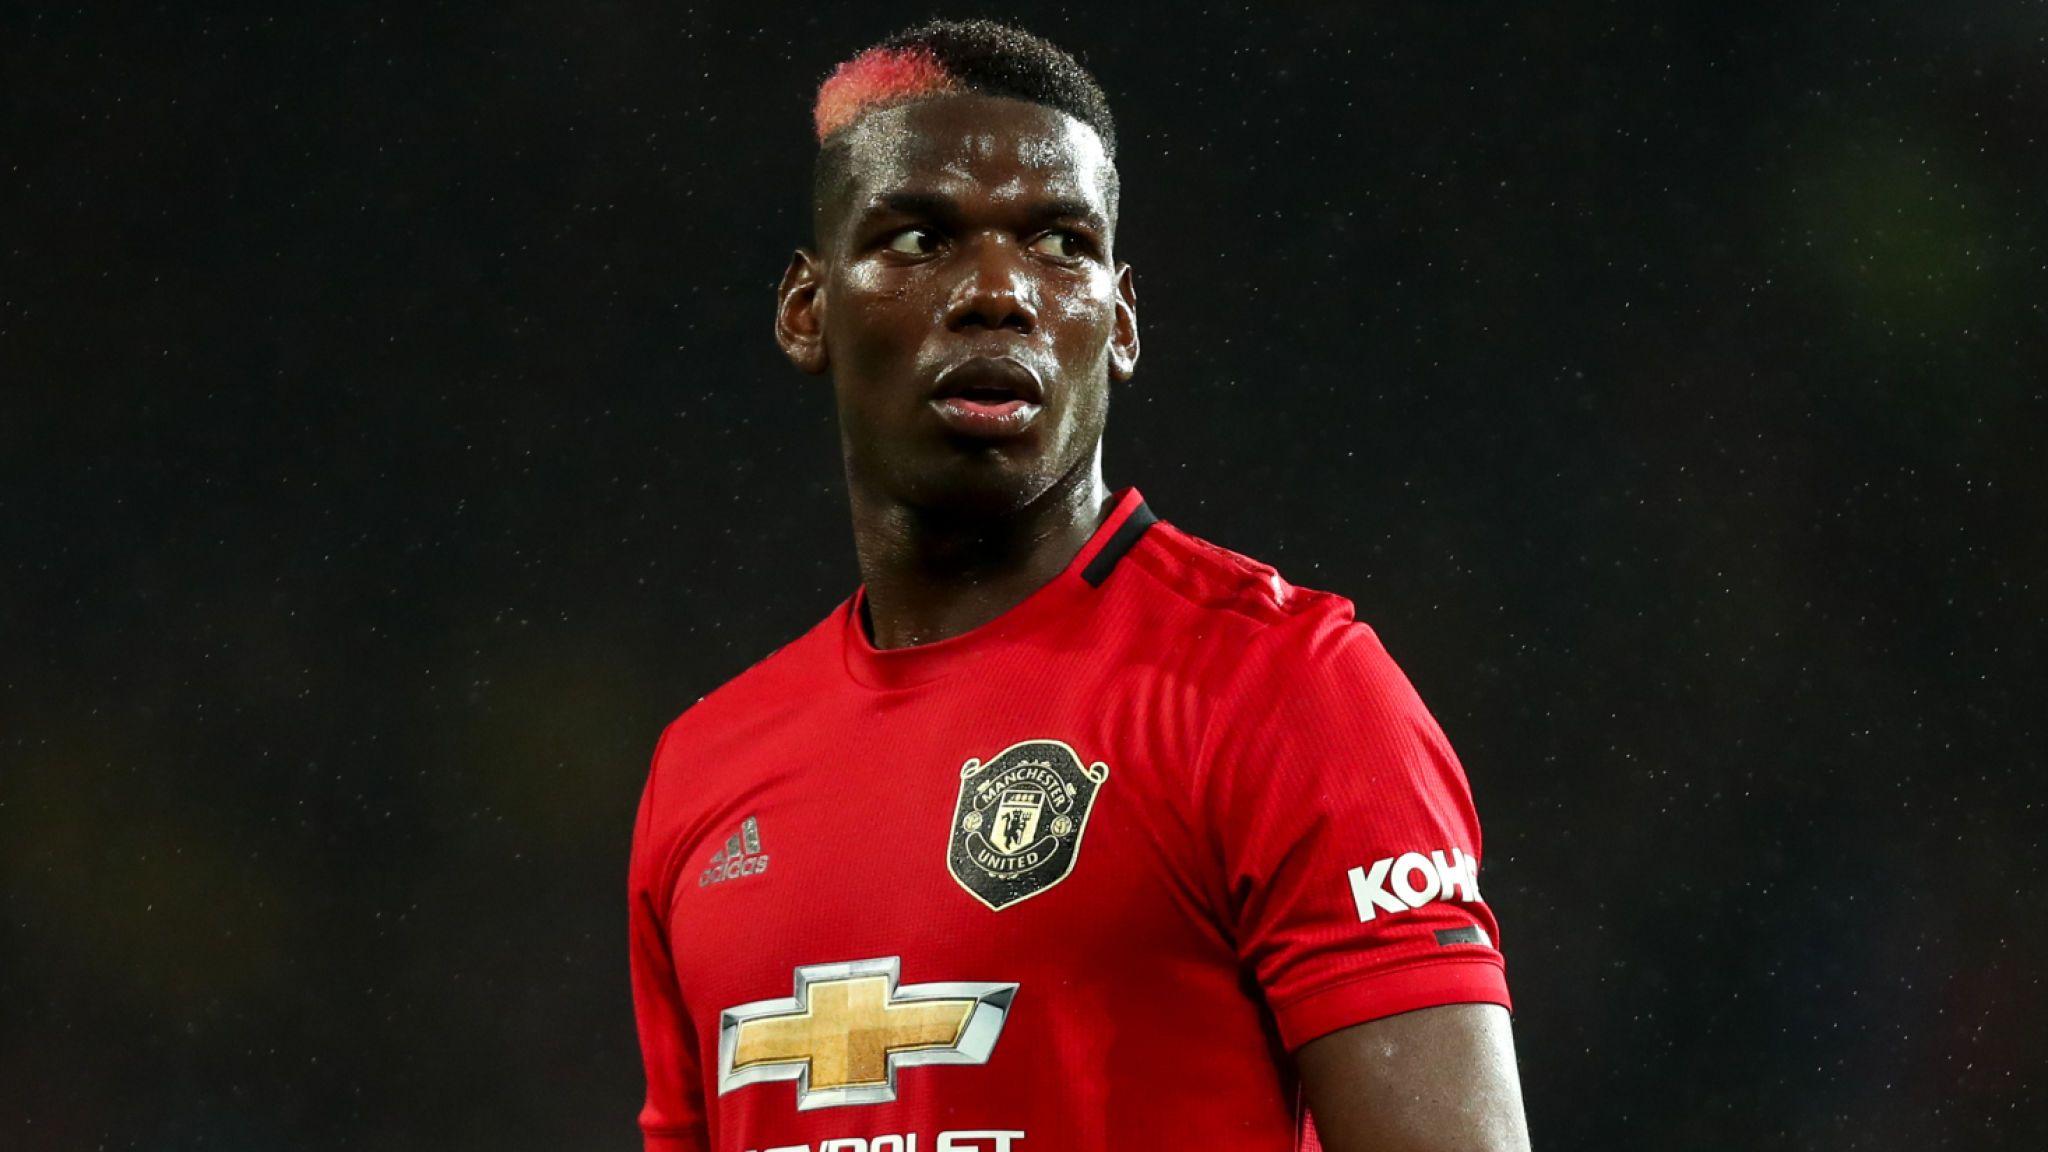 Man Utd ready to sell Paul Pogba to help complete mega-money transfers of star trio - Bóng Đá